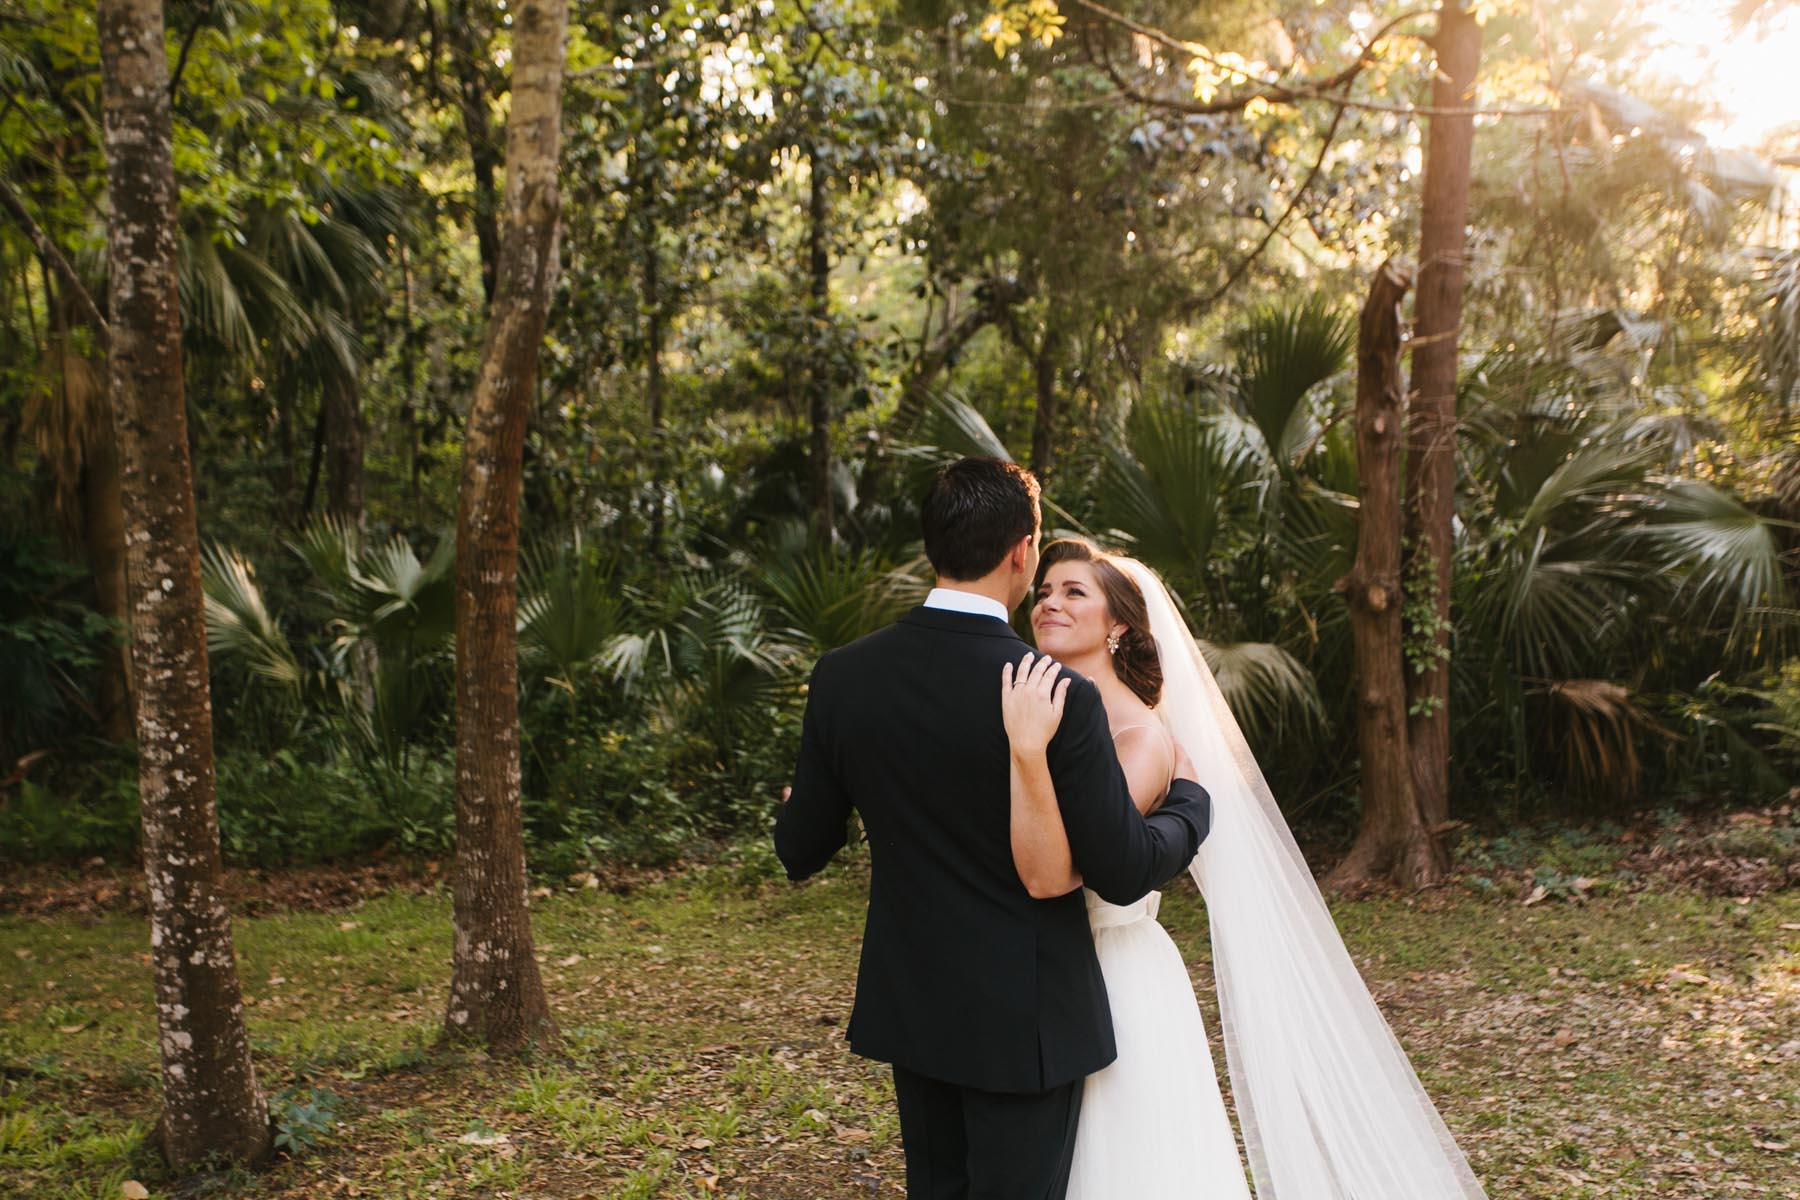 lowry wedding blog eden garden florida wedding-84